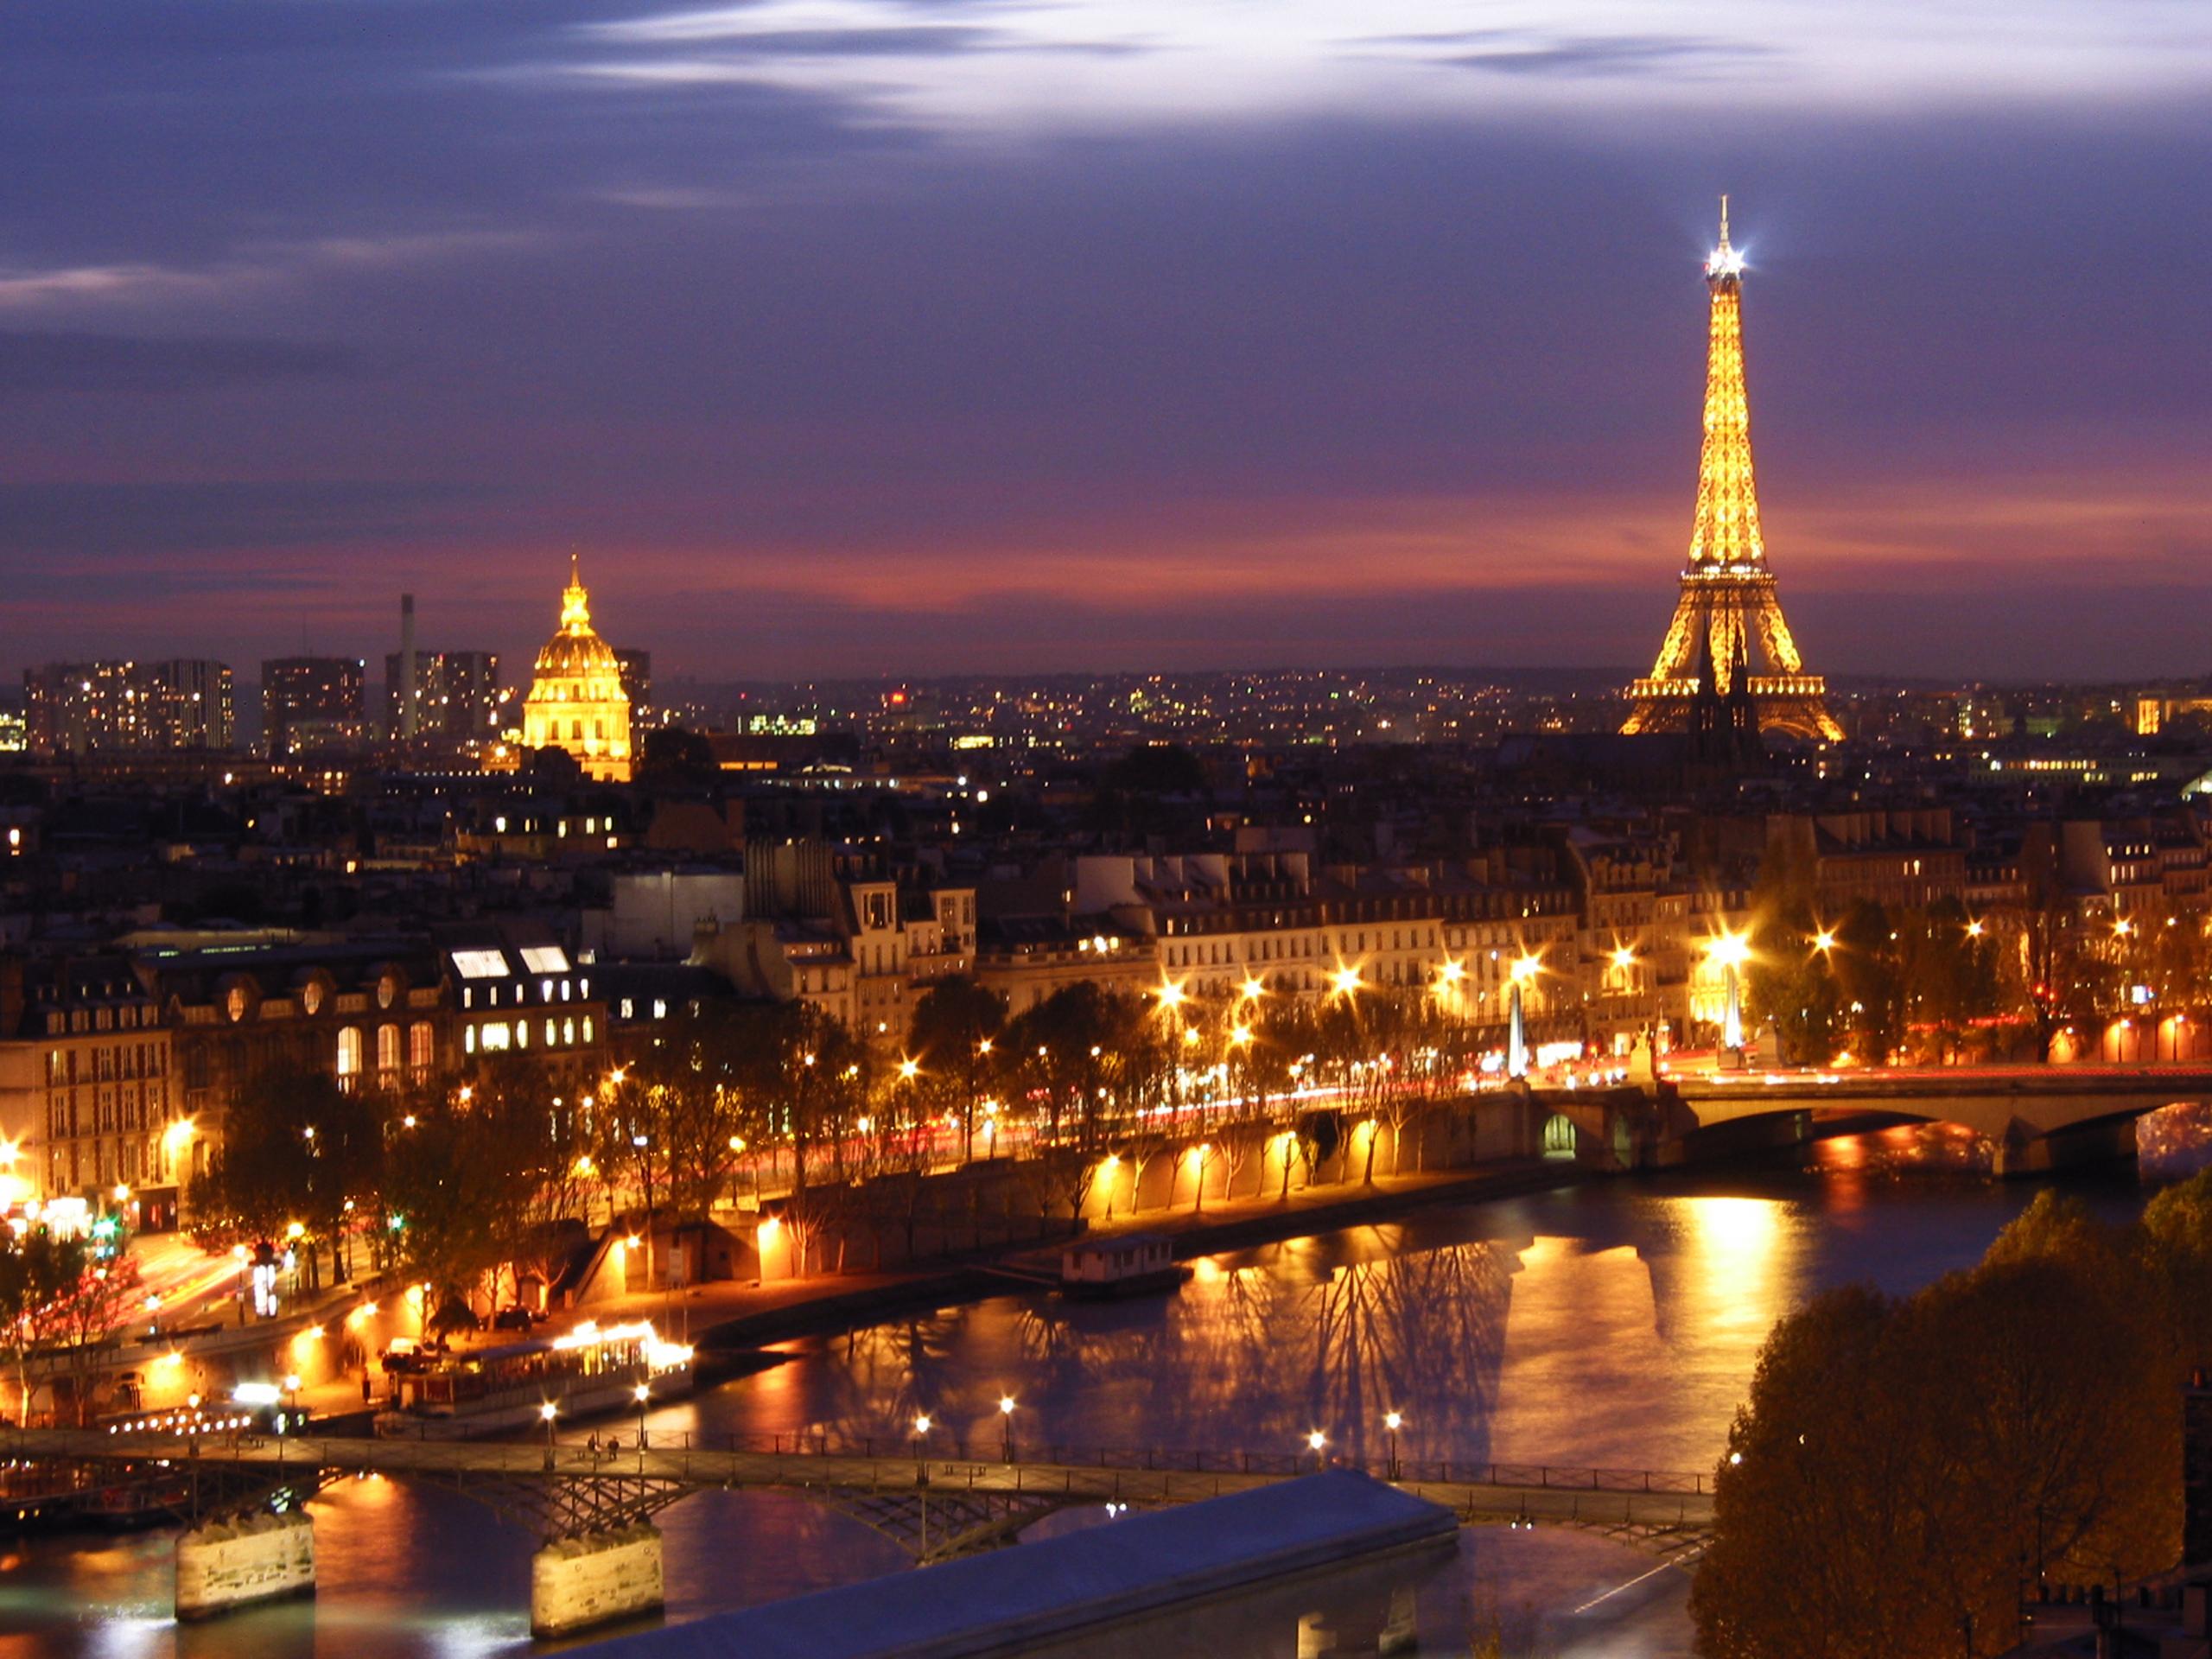 Paris City Wallpaper Beautiful Place 12920 Wallpaper Cool 2560x1920